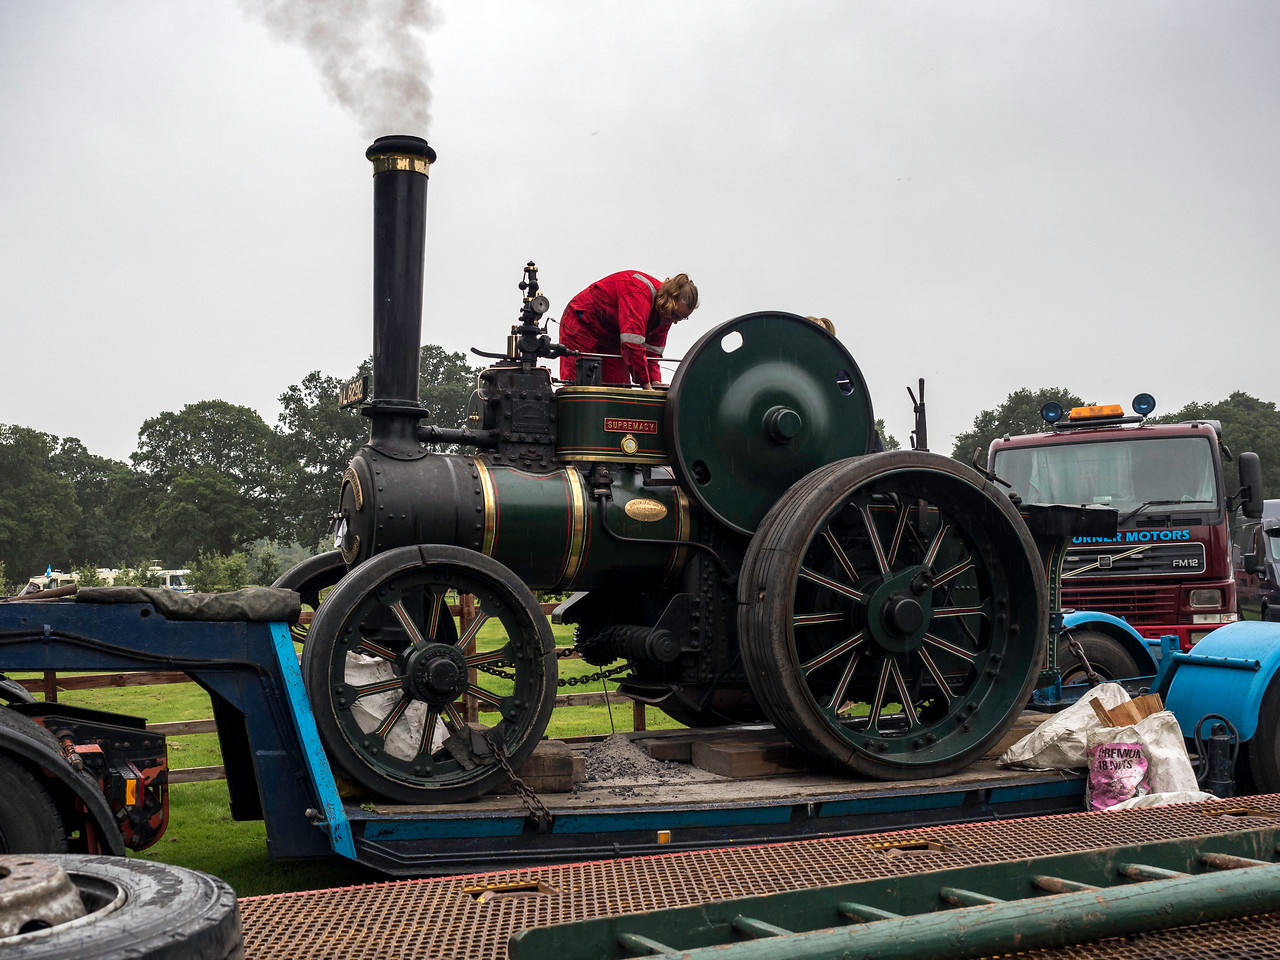 1924 Fowler General Purpose Engine 16289 'Supremacy'